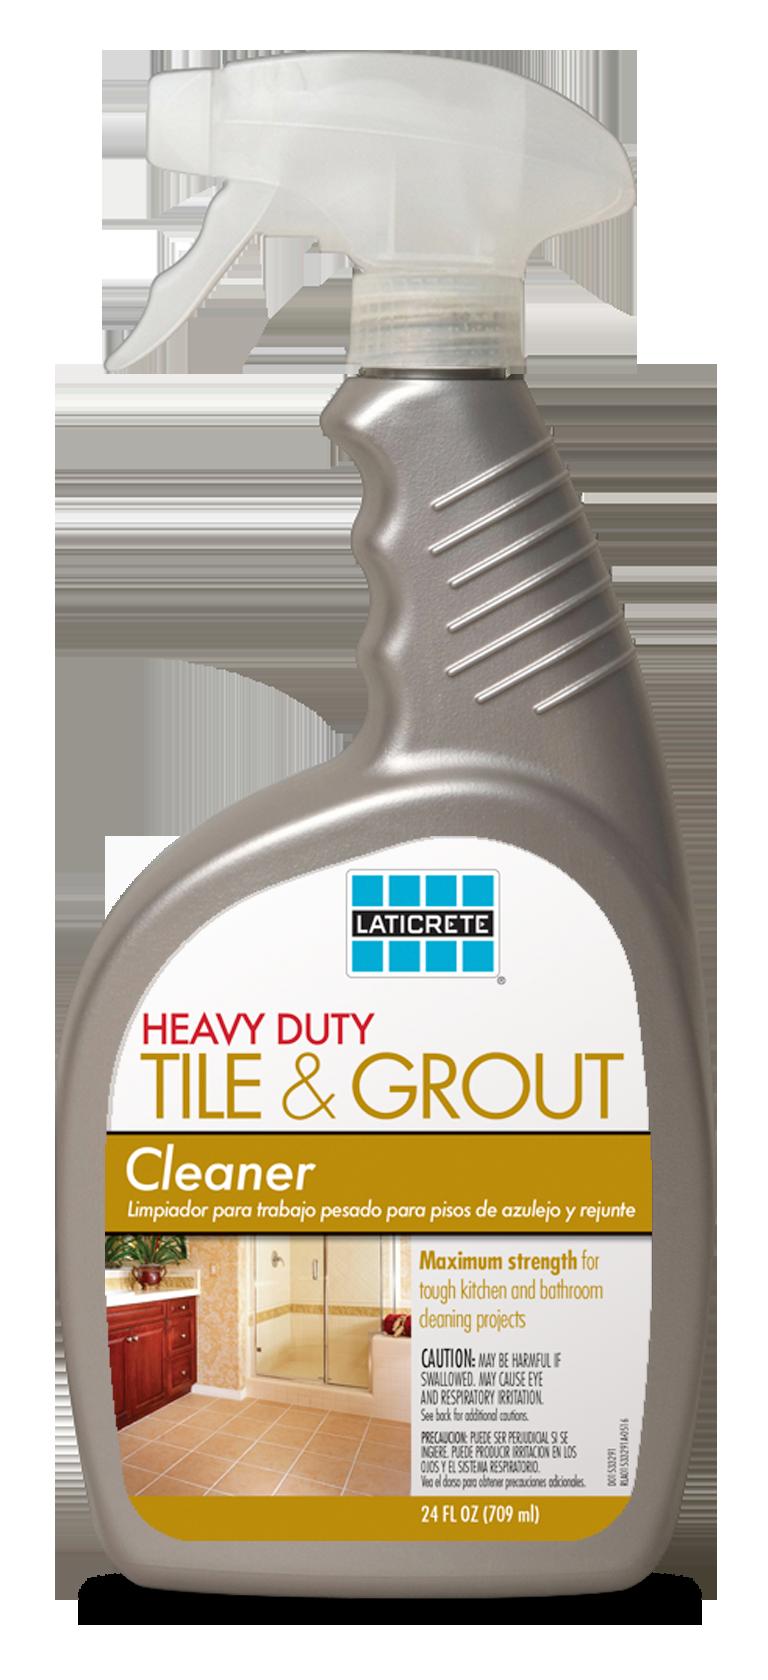 LATICRETE® Heavy Duty Tile & Grout Cleaner